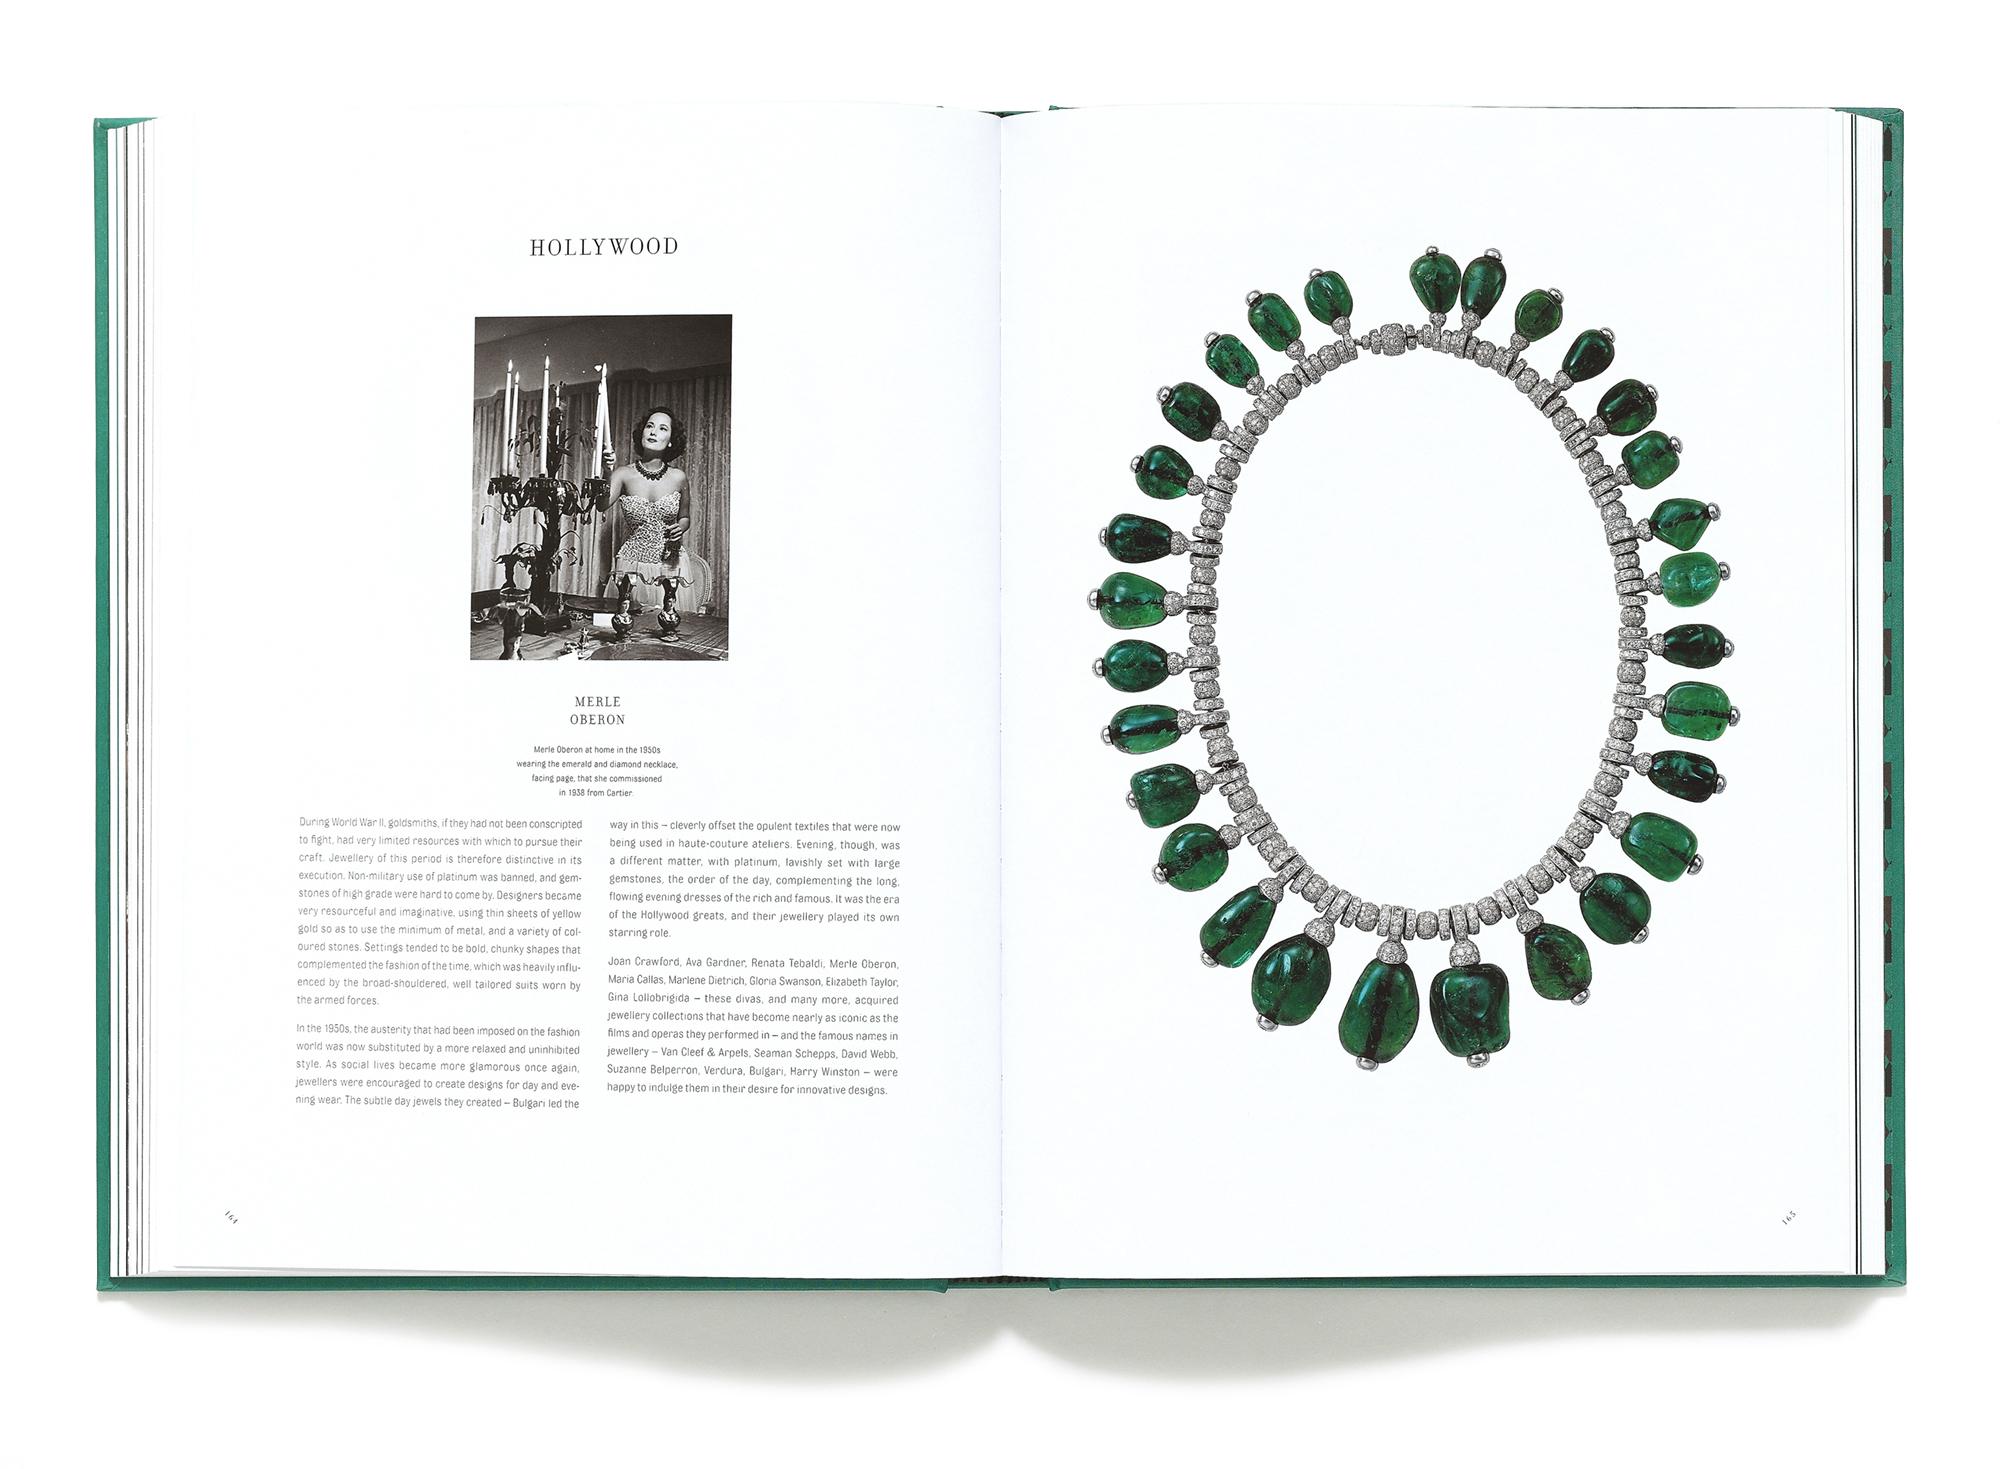 Emerald_Violette Editions_39.jpg